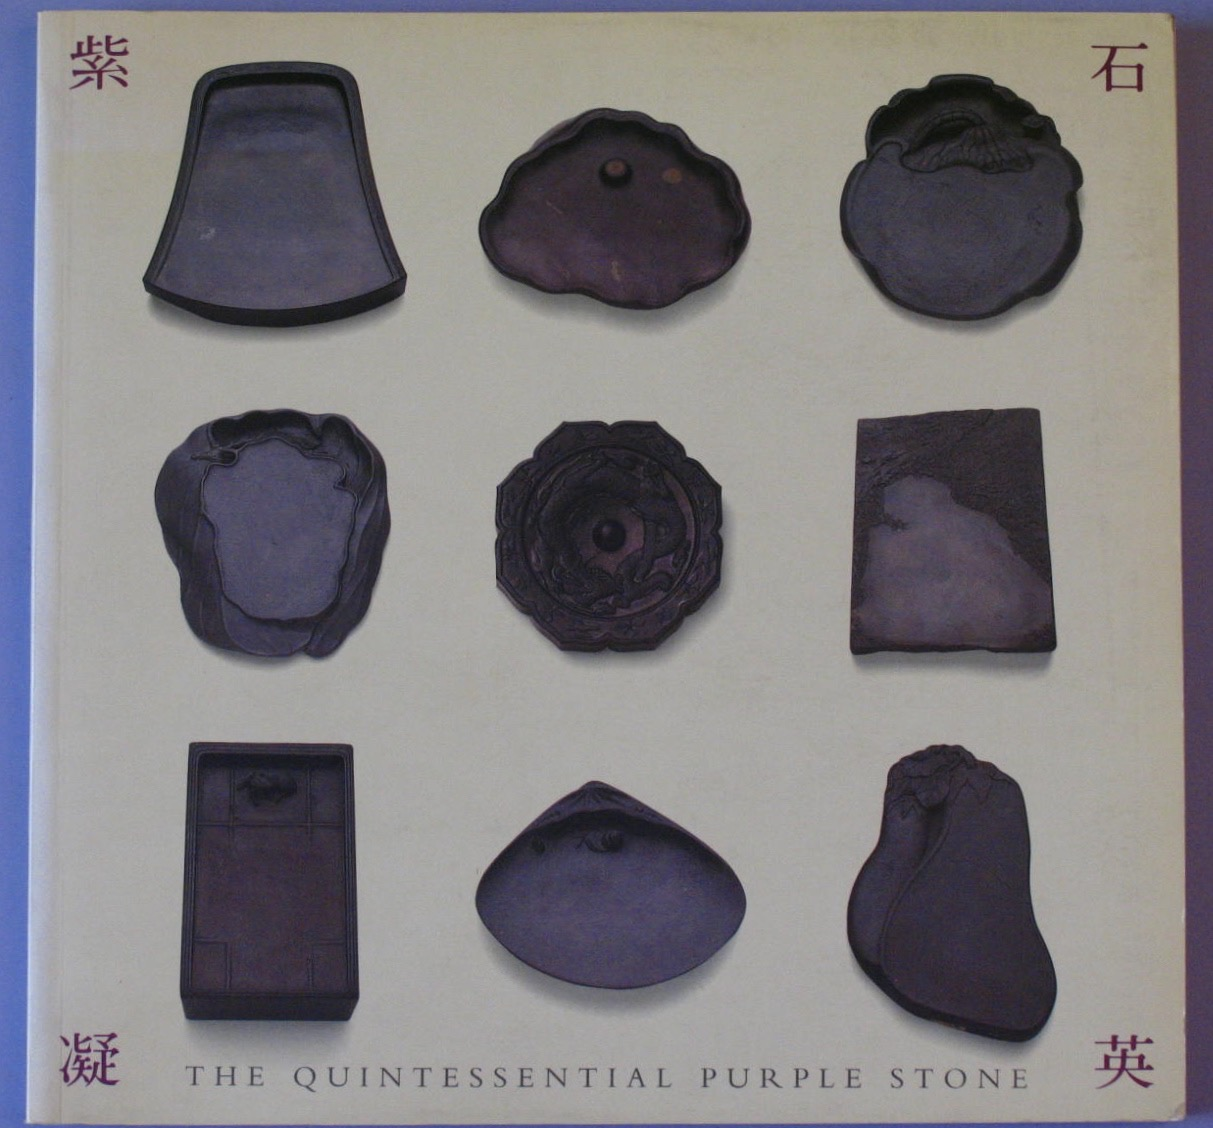 9627101206: Bookshop: The Quintessential Purple Stone: Duan Inkstones Through the Ages